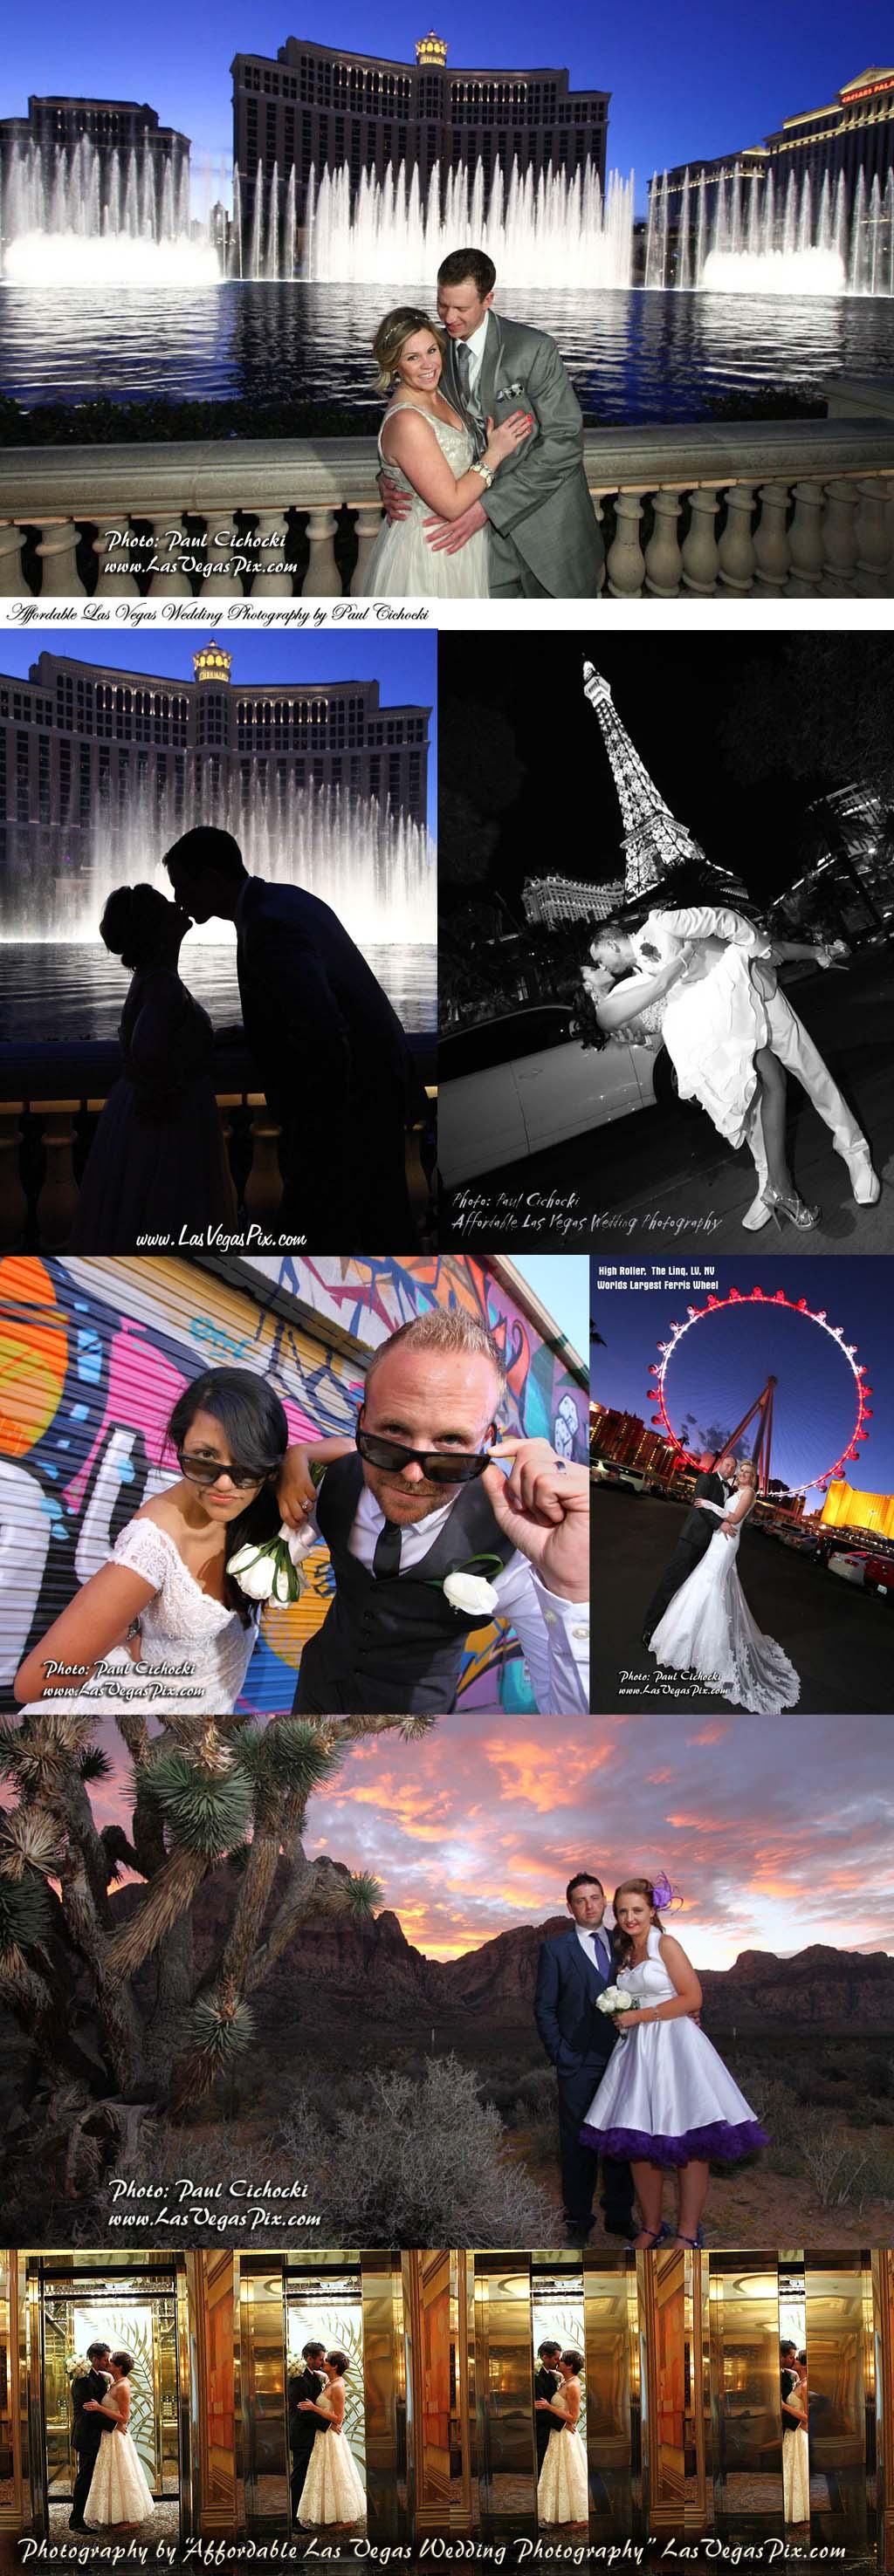 Affordable Las Vegas Wedding Photography Offers Budget Prices On Lasvegas Weddings Photographer Chapel Minister Chapels Elvis